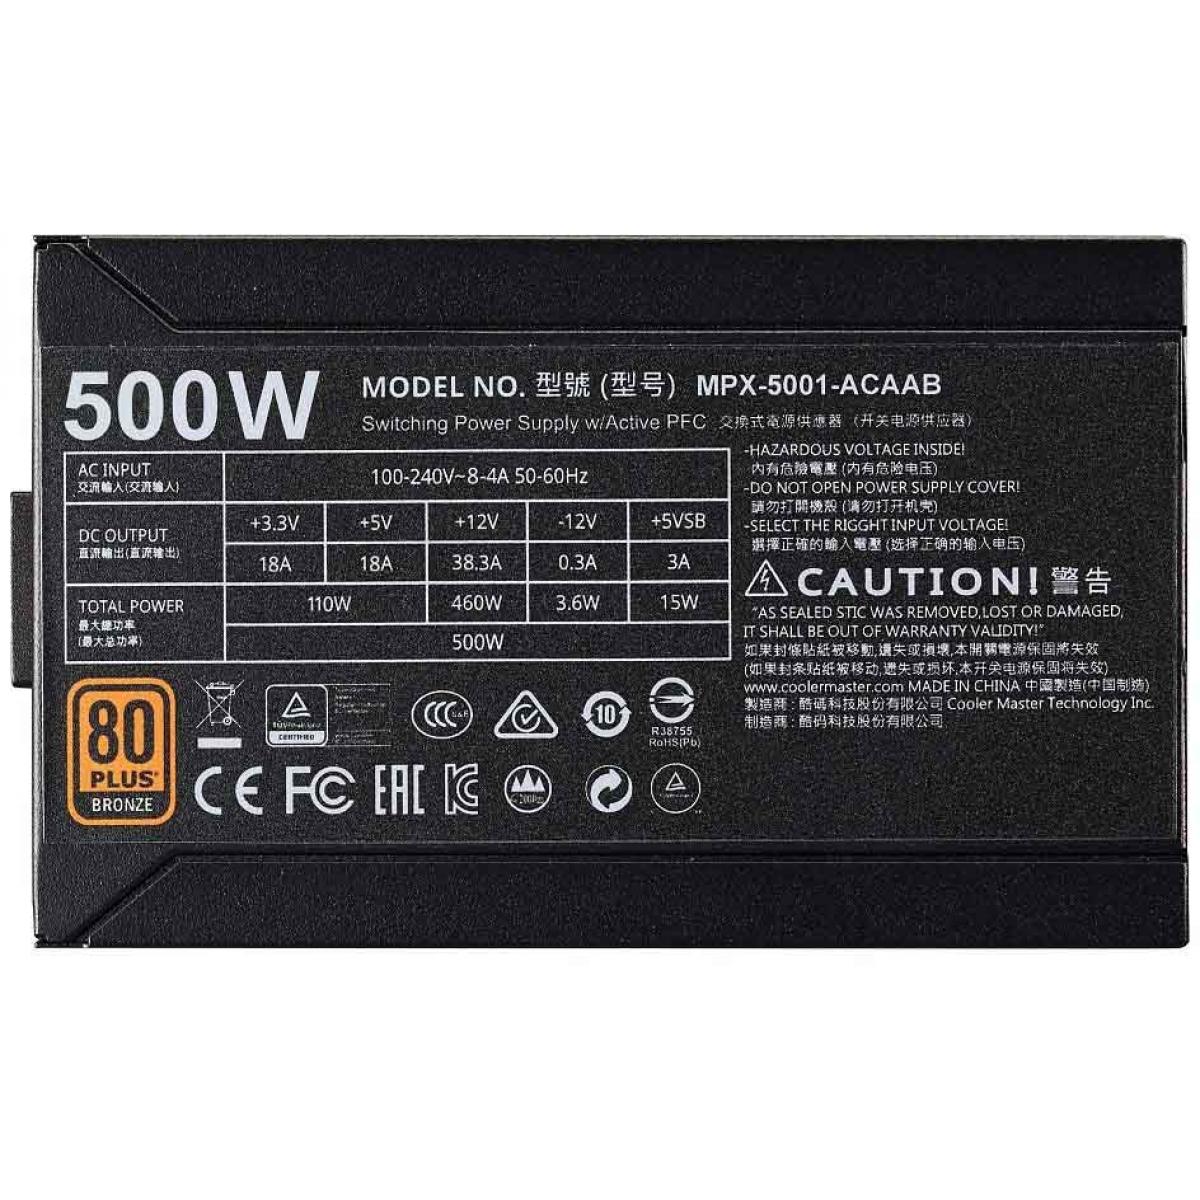 Fonte Cooler Master Masterwatt 500W, Com Cabo, 80 Plus Bronze, PFC Ativo, MPX-5001-ACAAB-WO